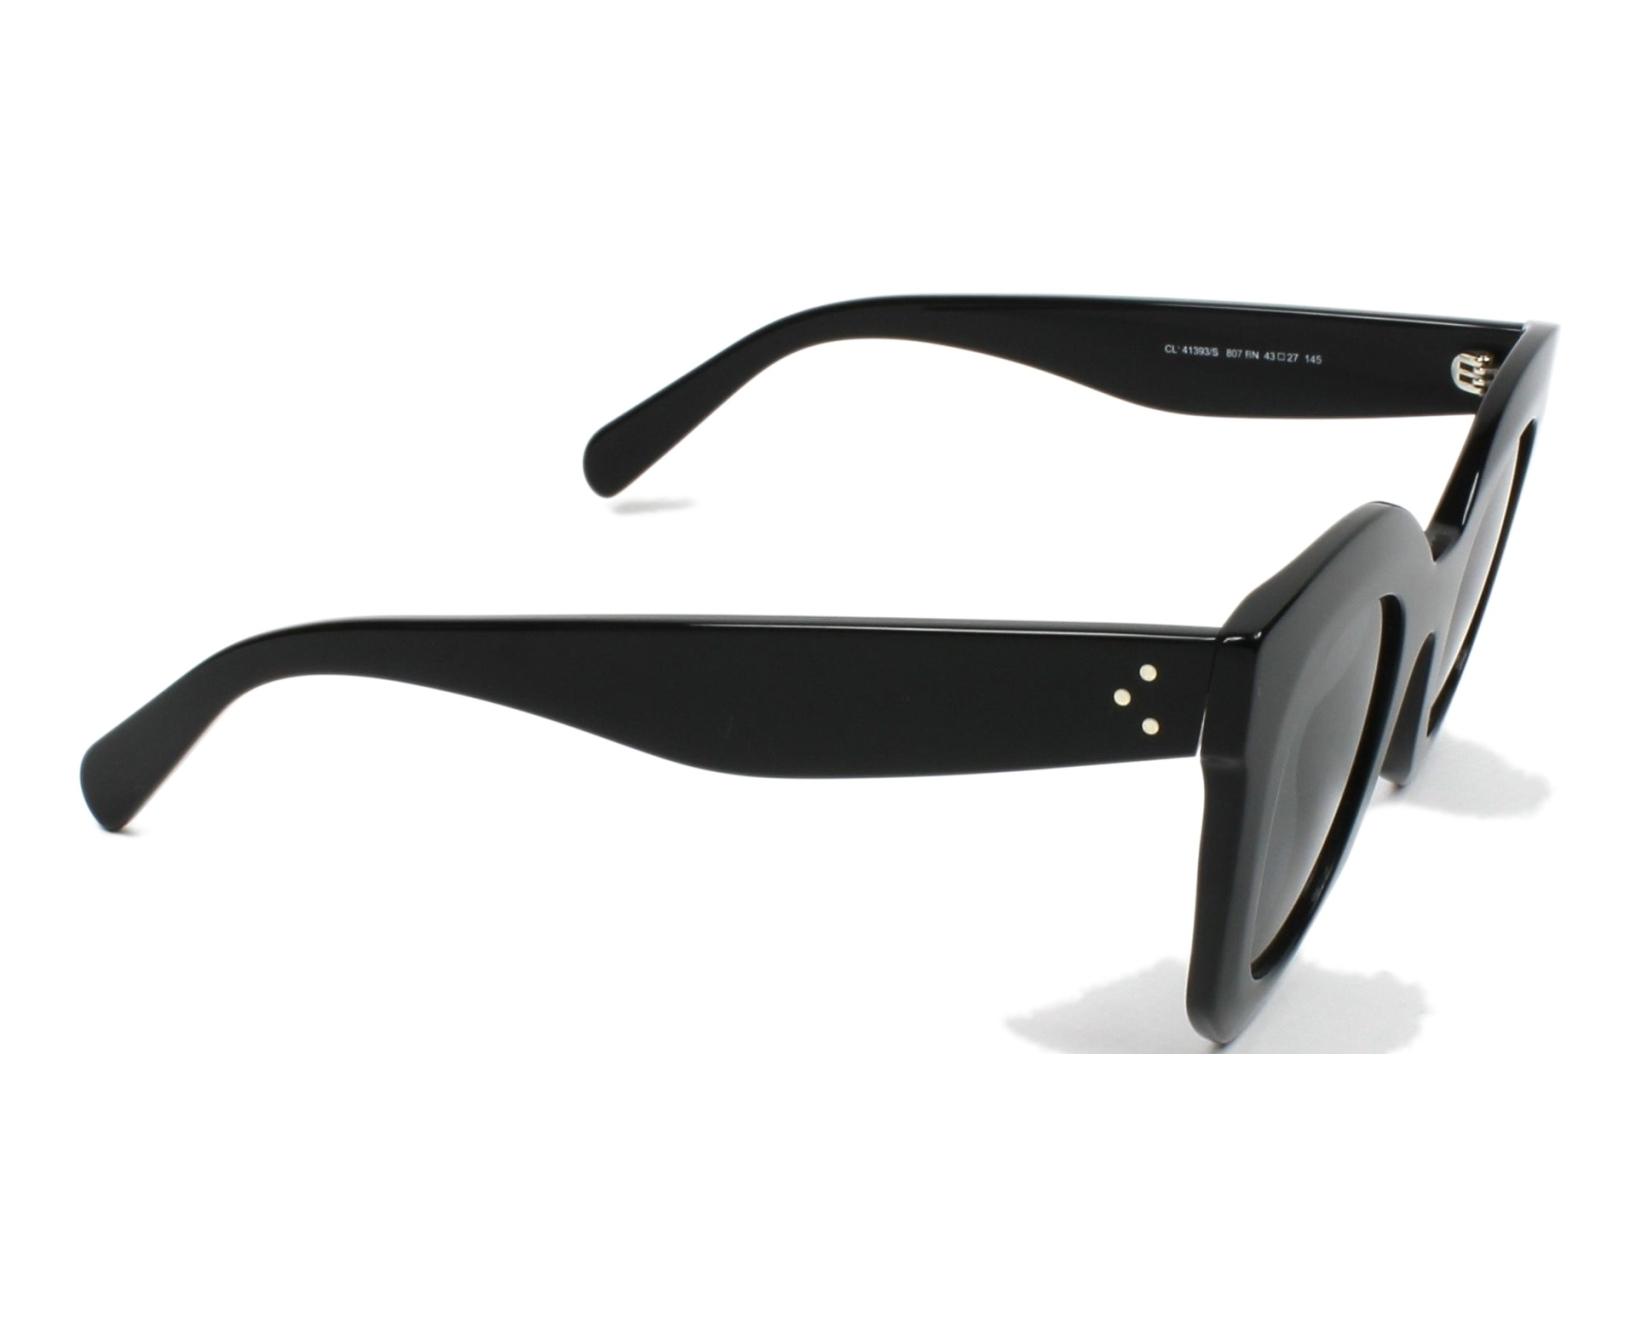 34b6c4a5bf67 thumbnail Sunglasses Céline CL-41393-S 807 BN - Black side view